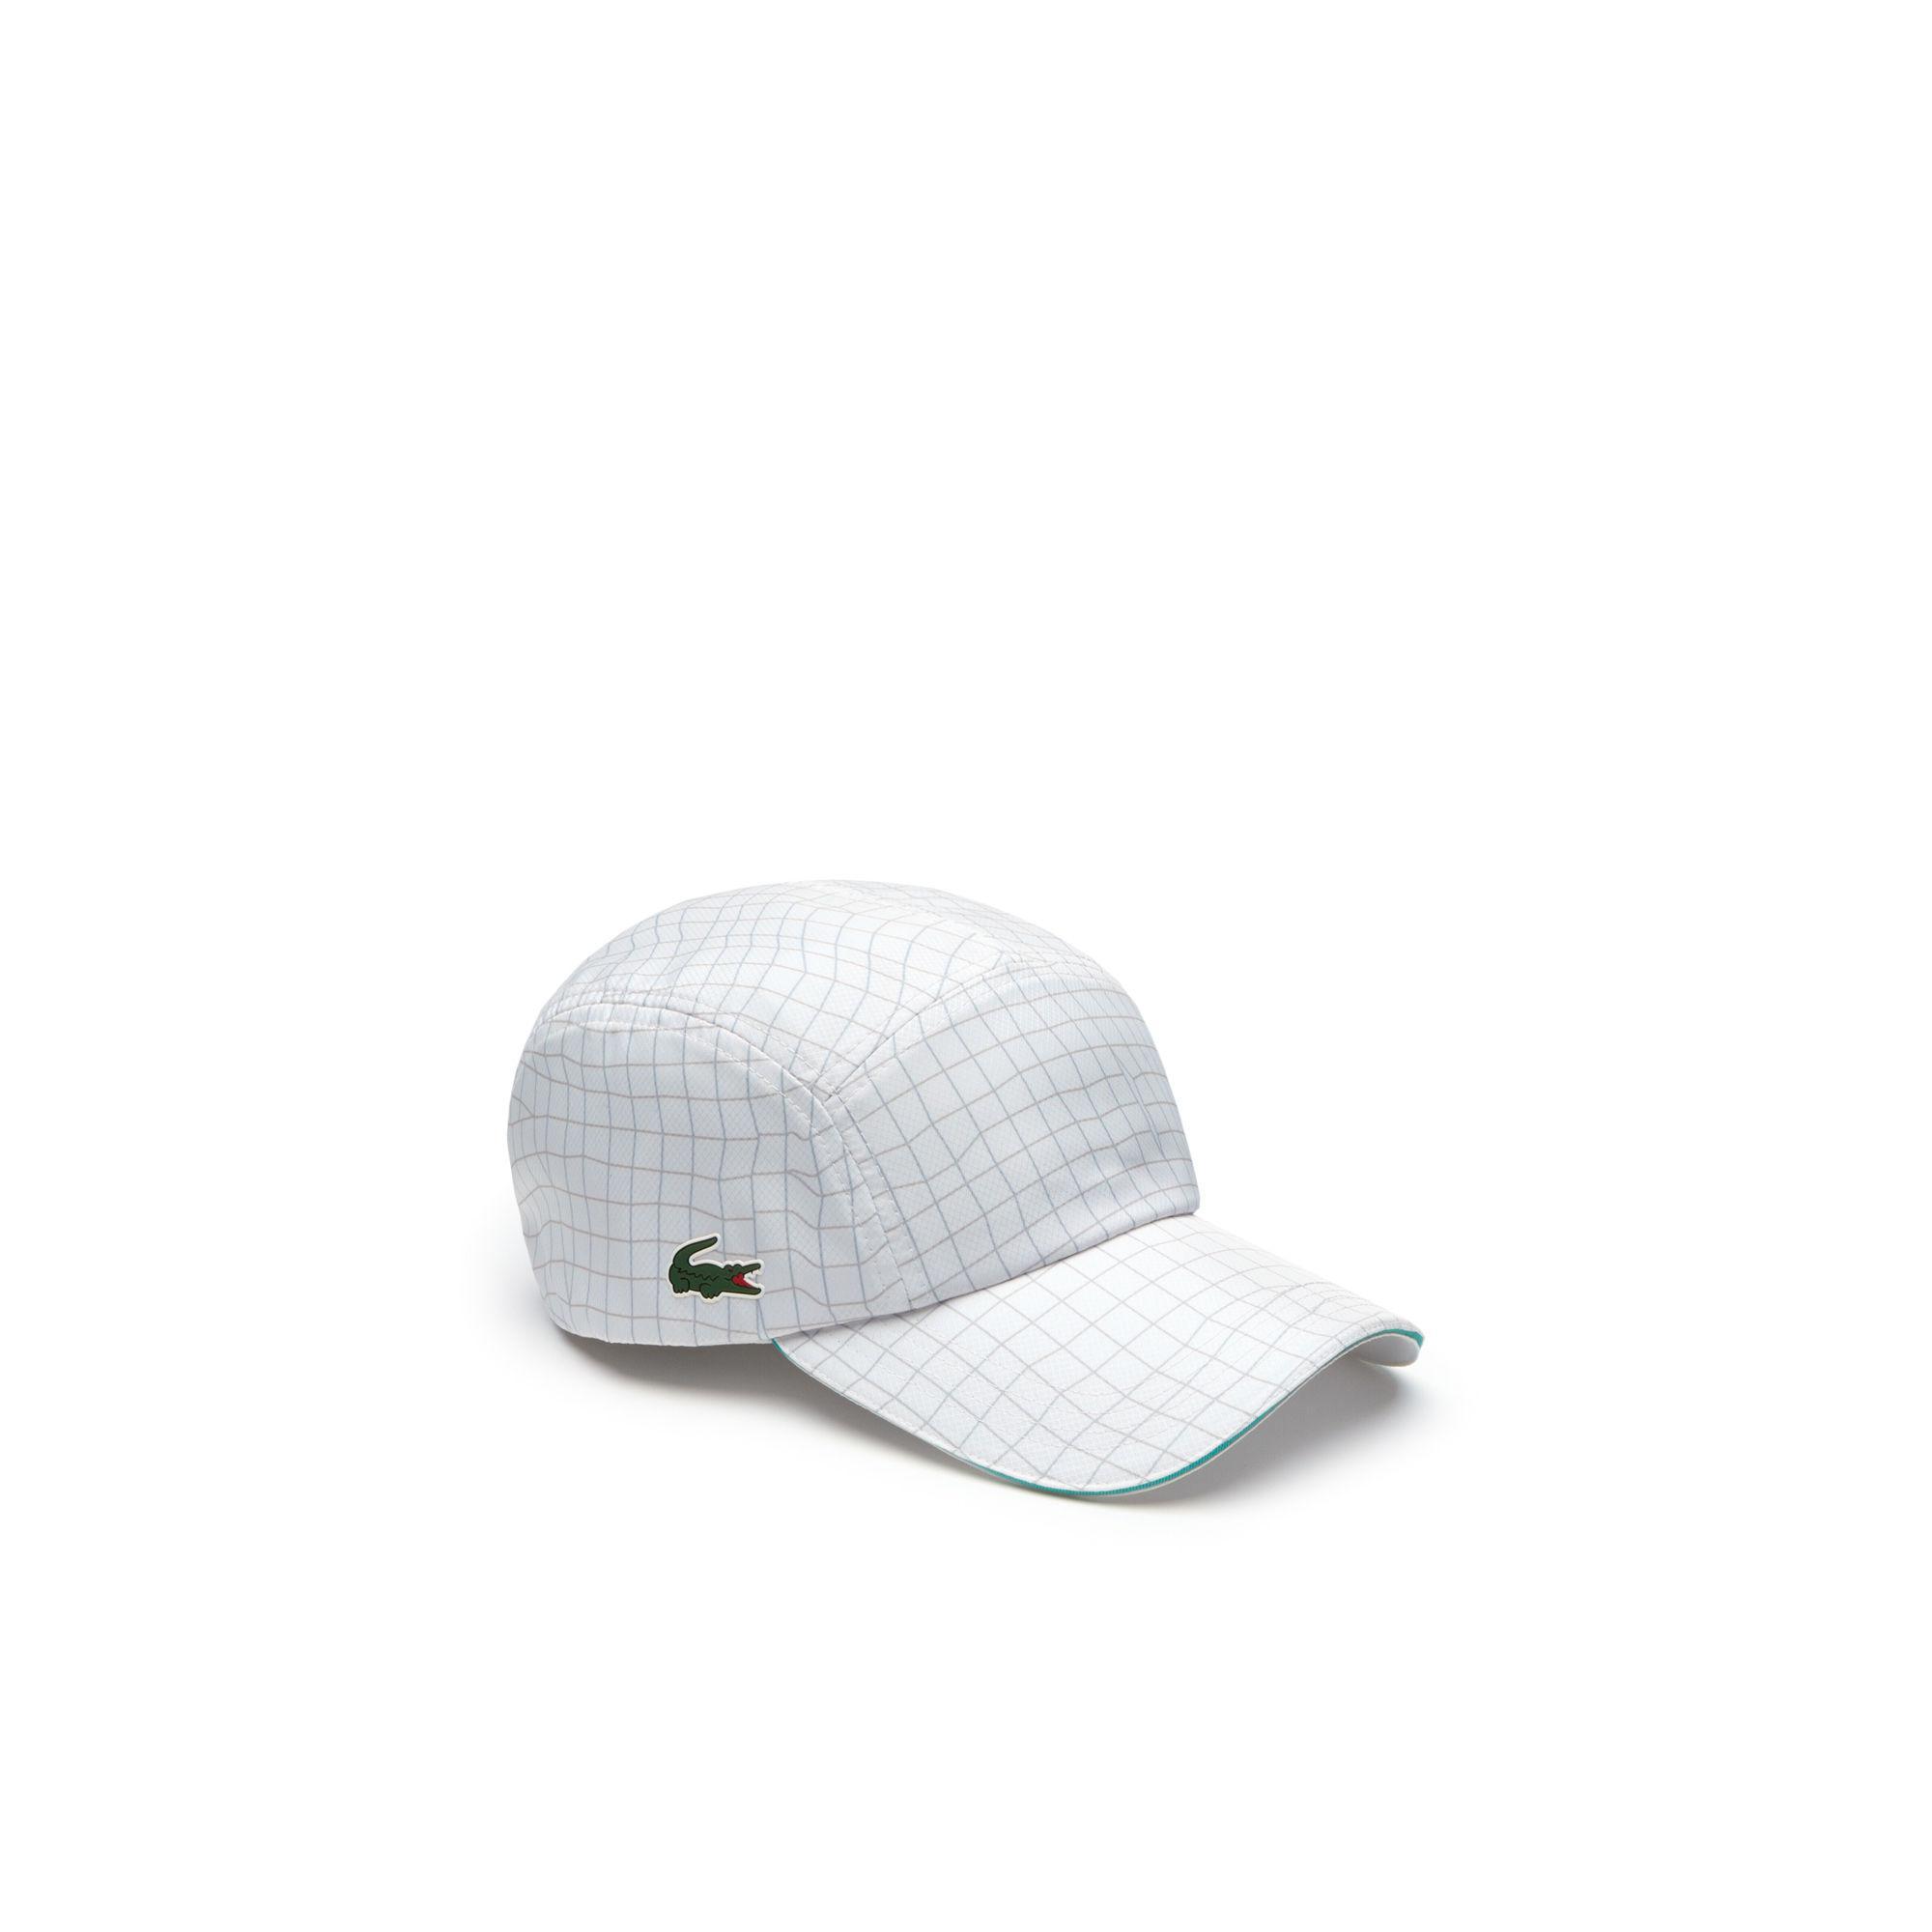 bb33d7159ebf1 Lacoste White Sport Tennis Colourblock Taffeta Cap for men